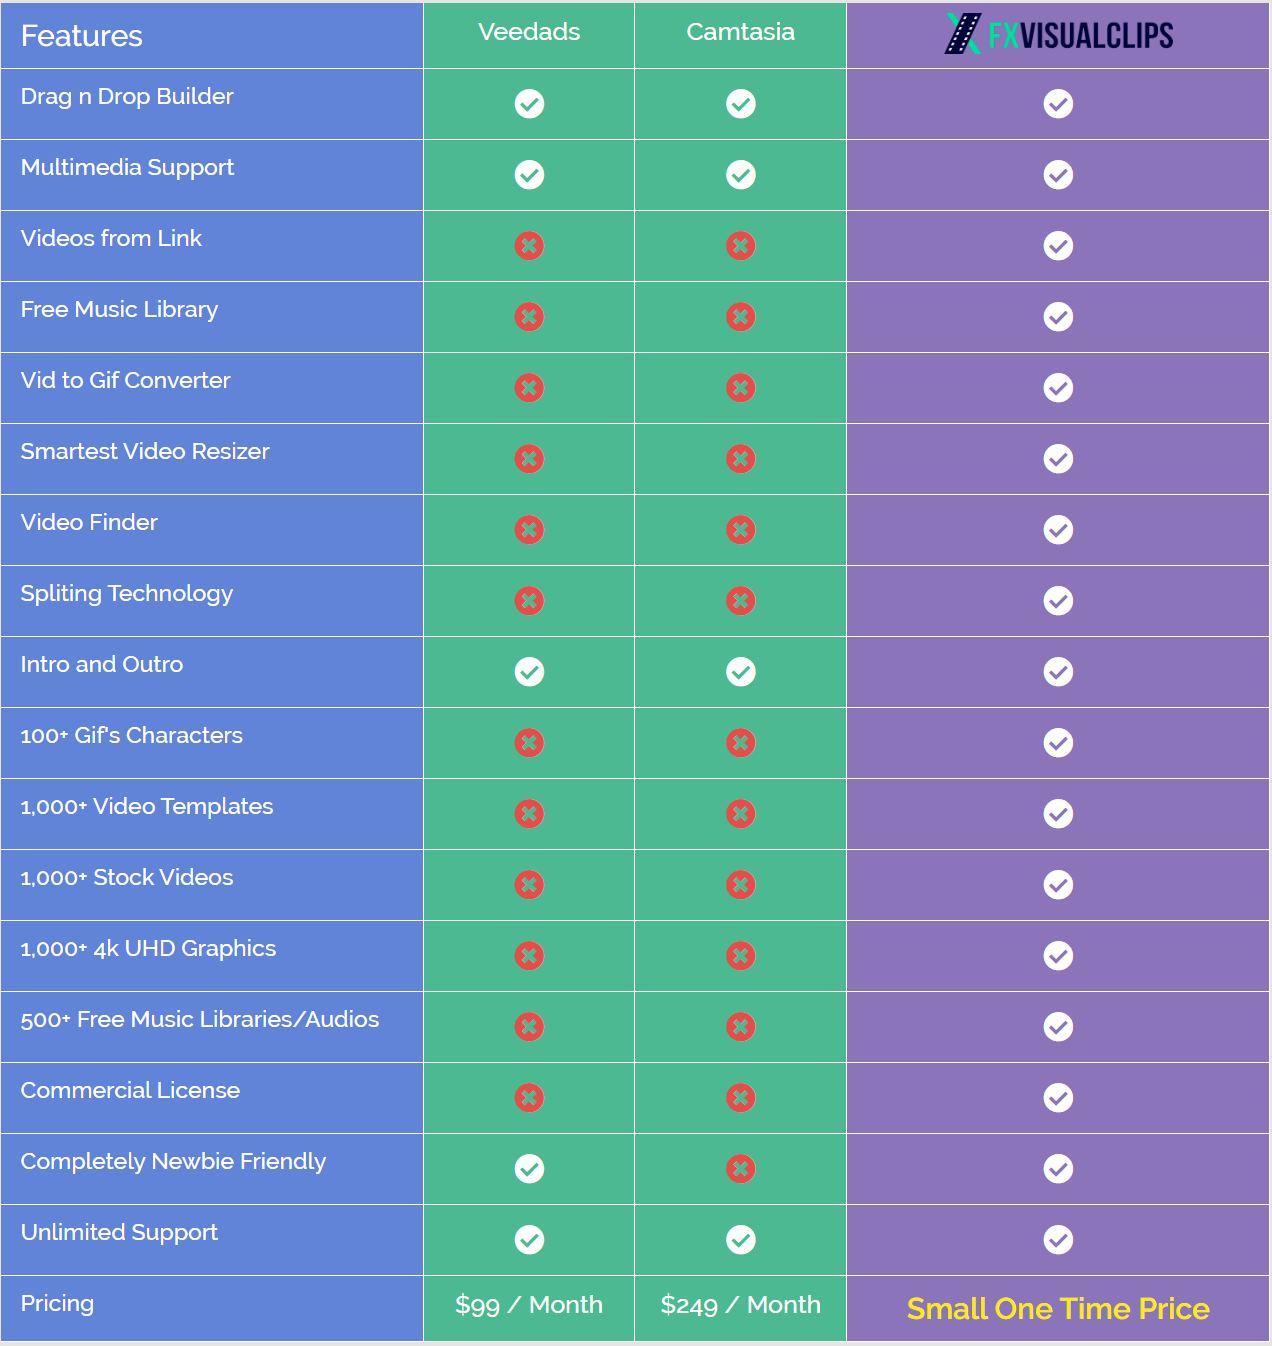 FX Visual Clips Comparion